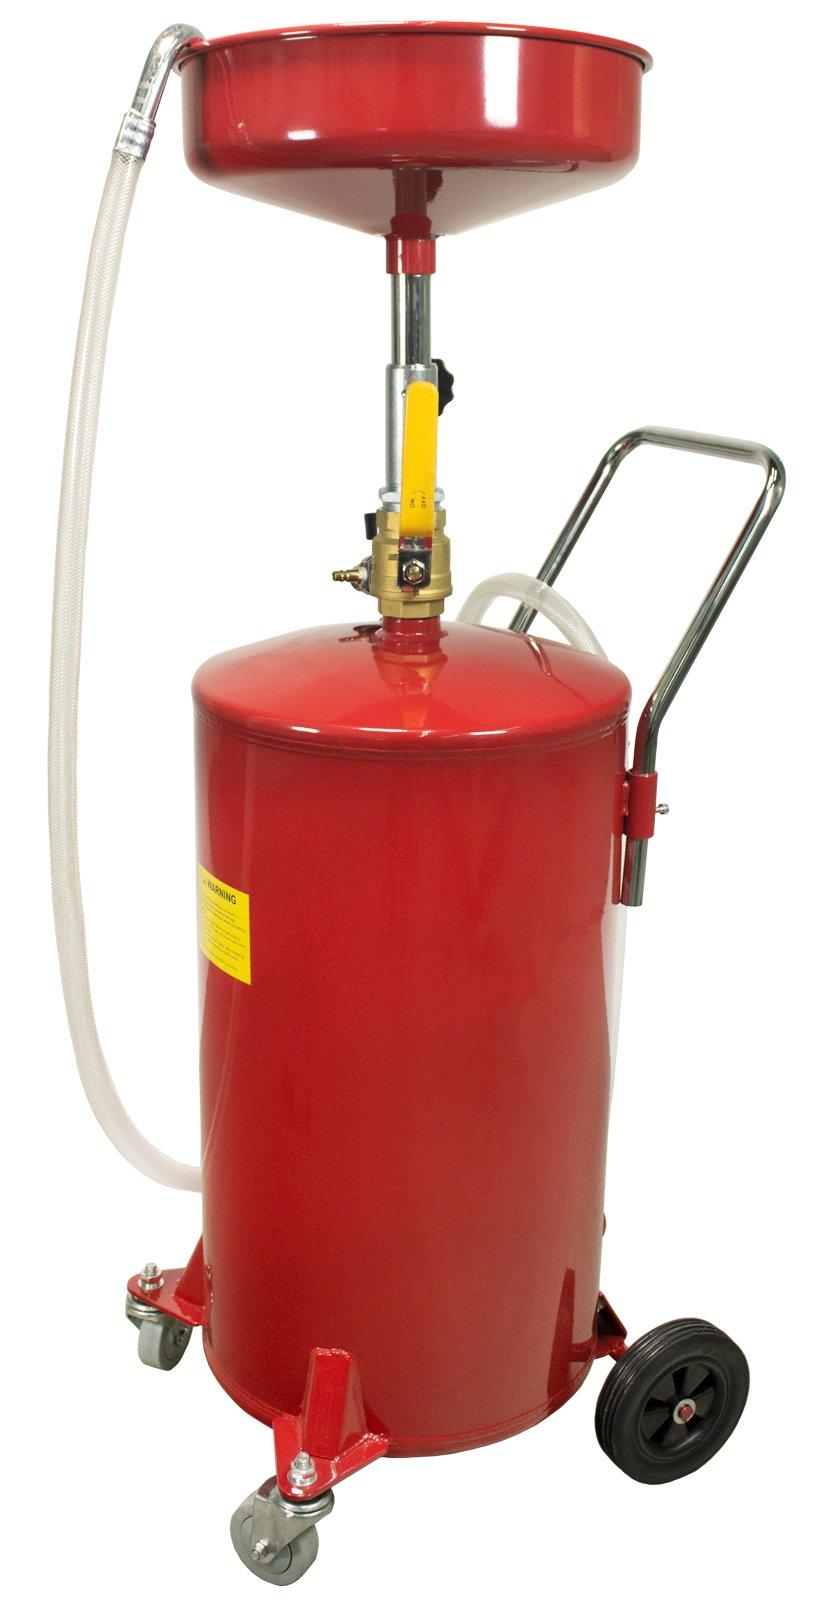 Dragway Tools 18 Gallon Oil Waste Drain Tank Pan for Lift Jack Hoist Shop Crane by Dragway Tools